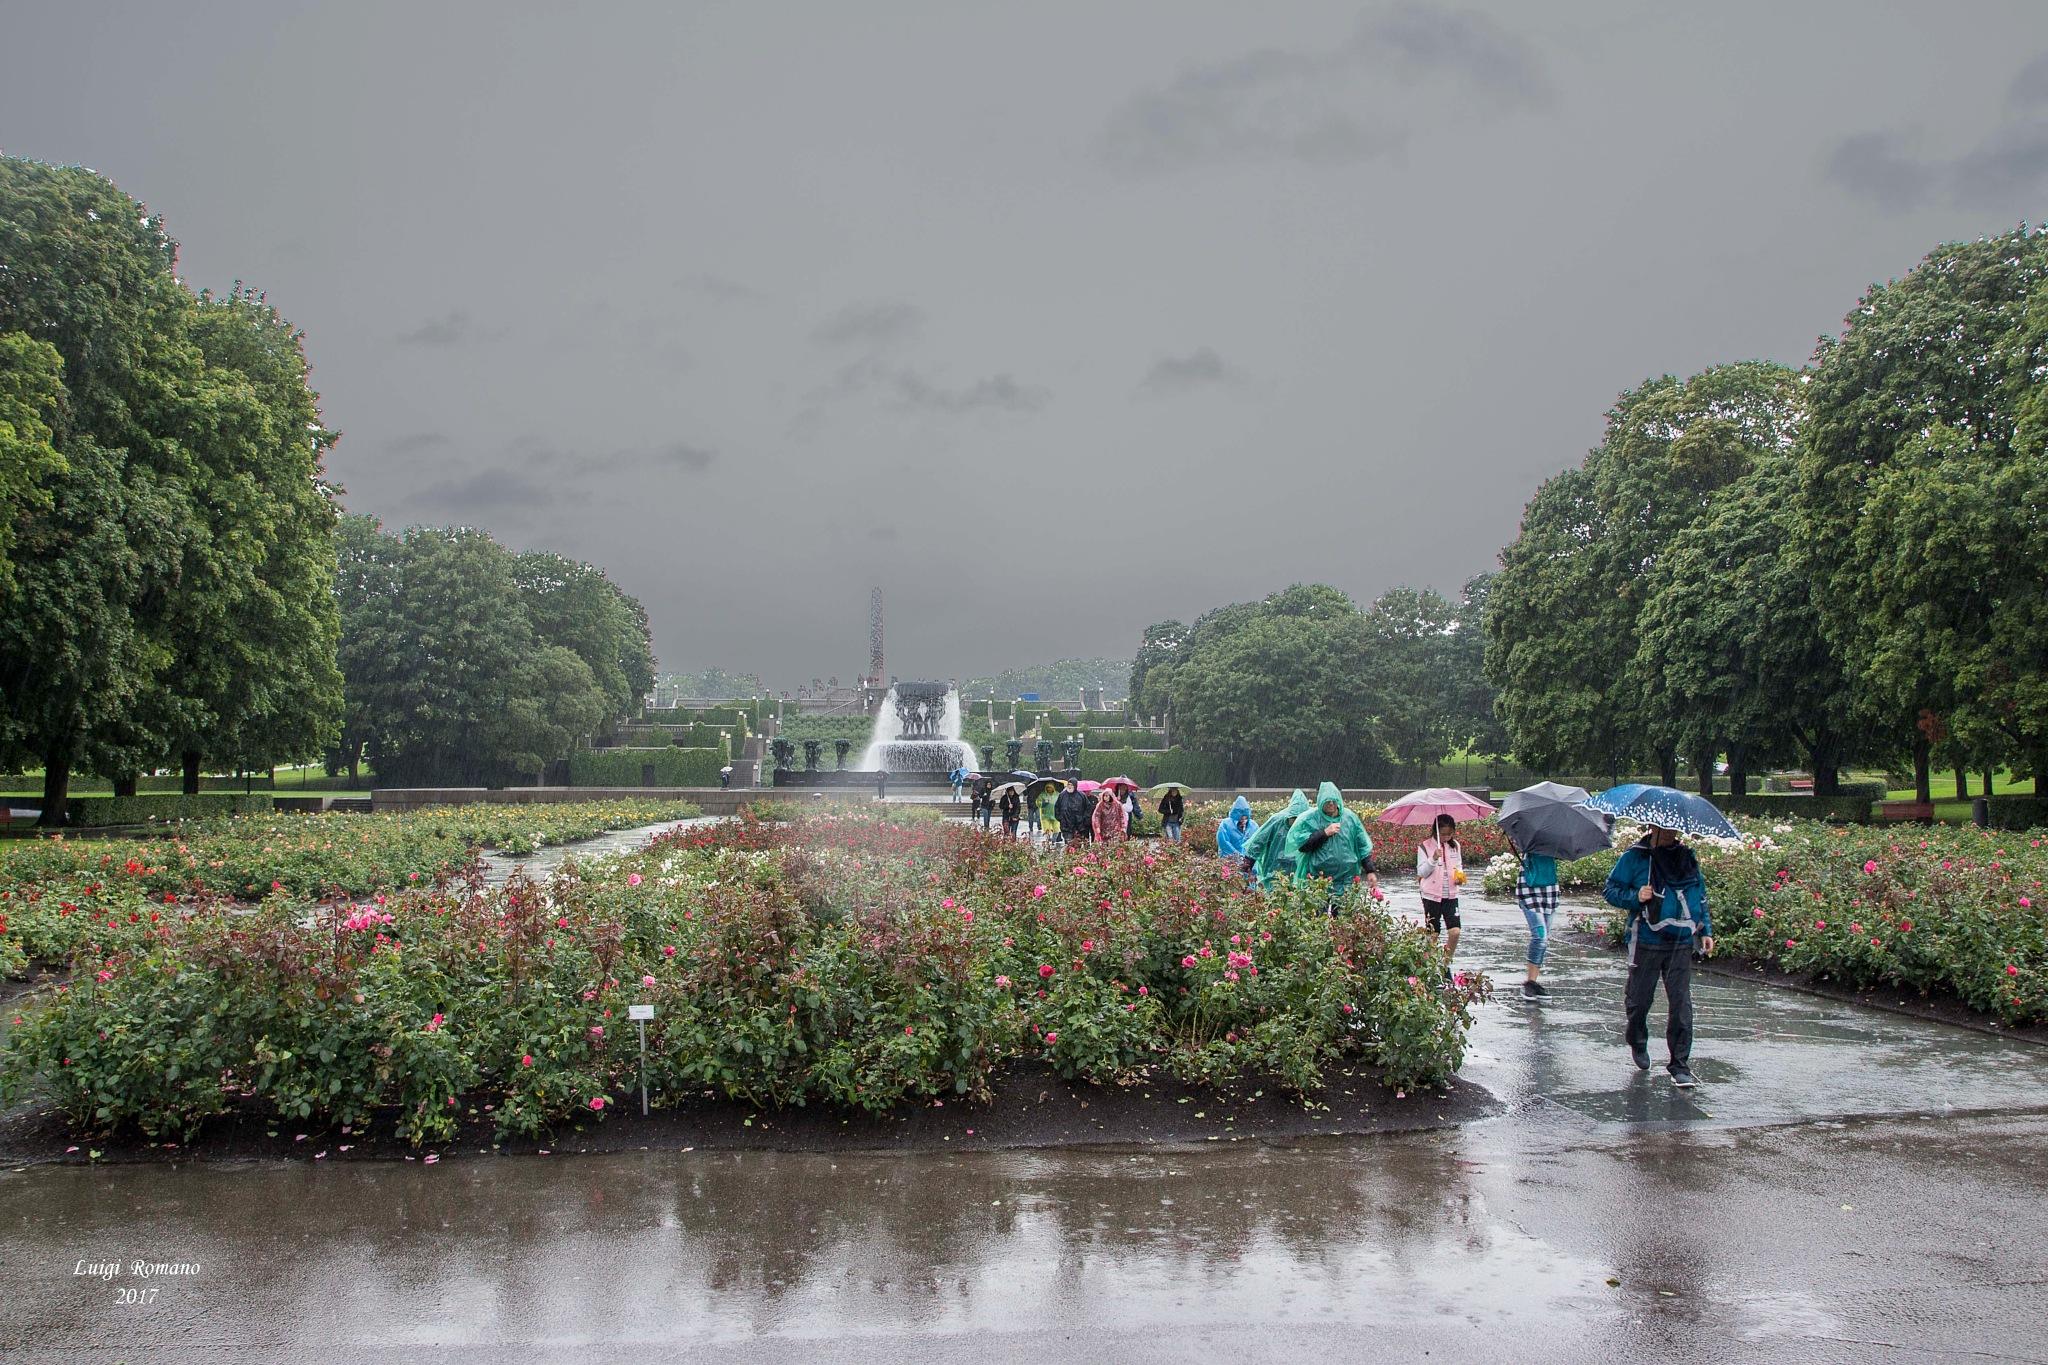 Visit the Vigeland Park in heavy rain by Luigi Romano